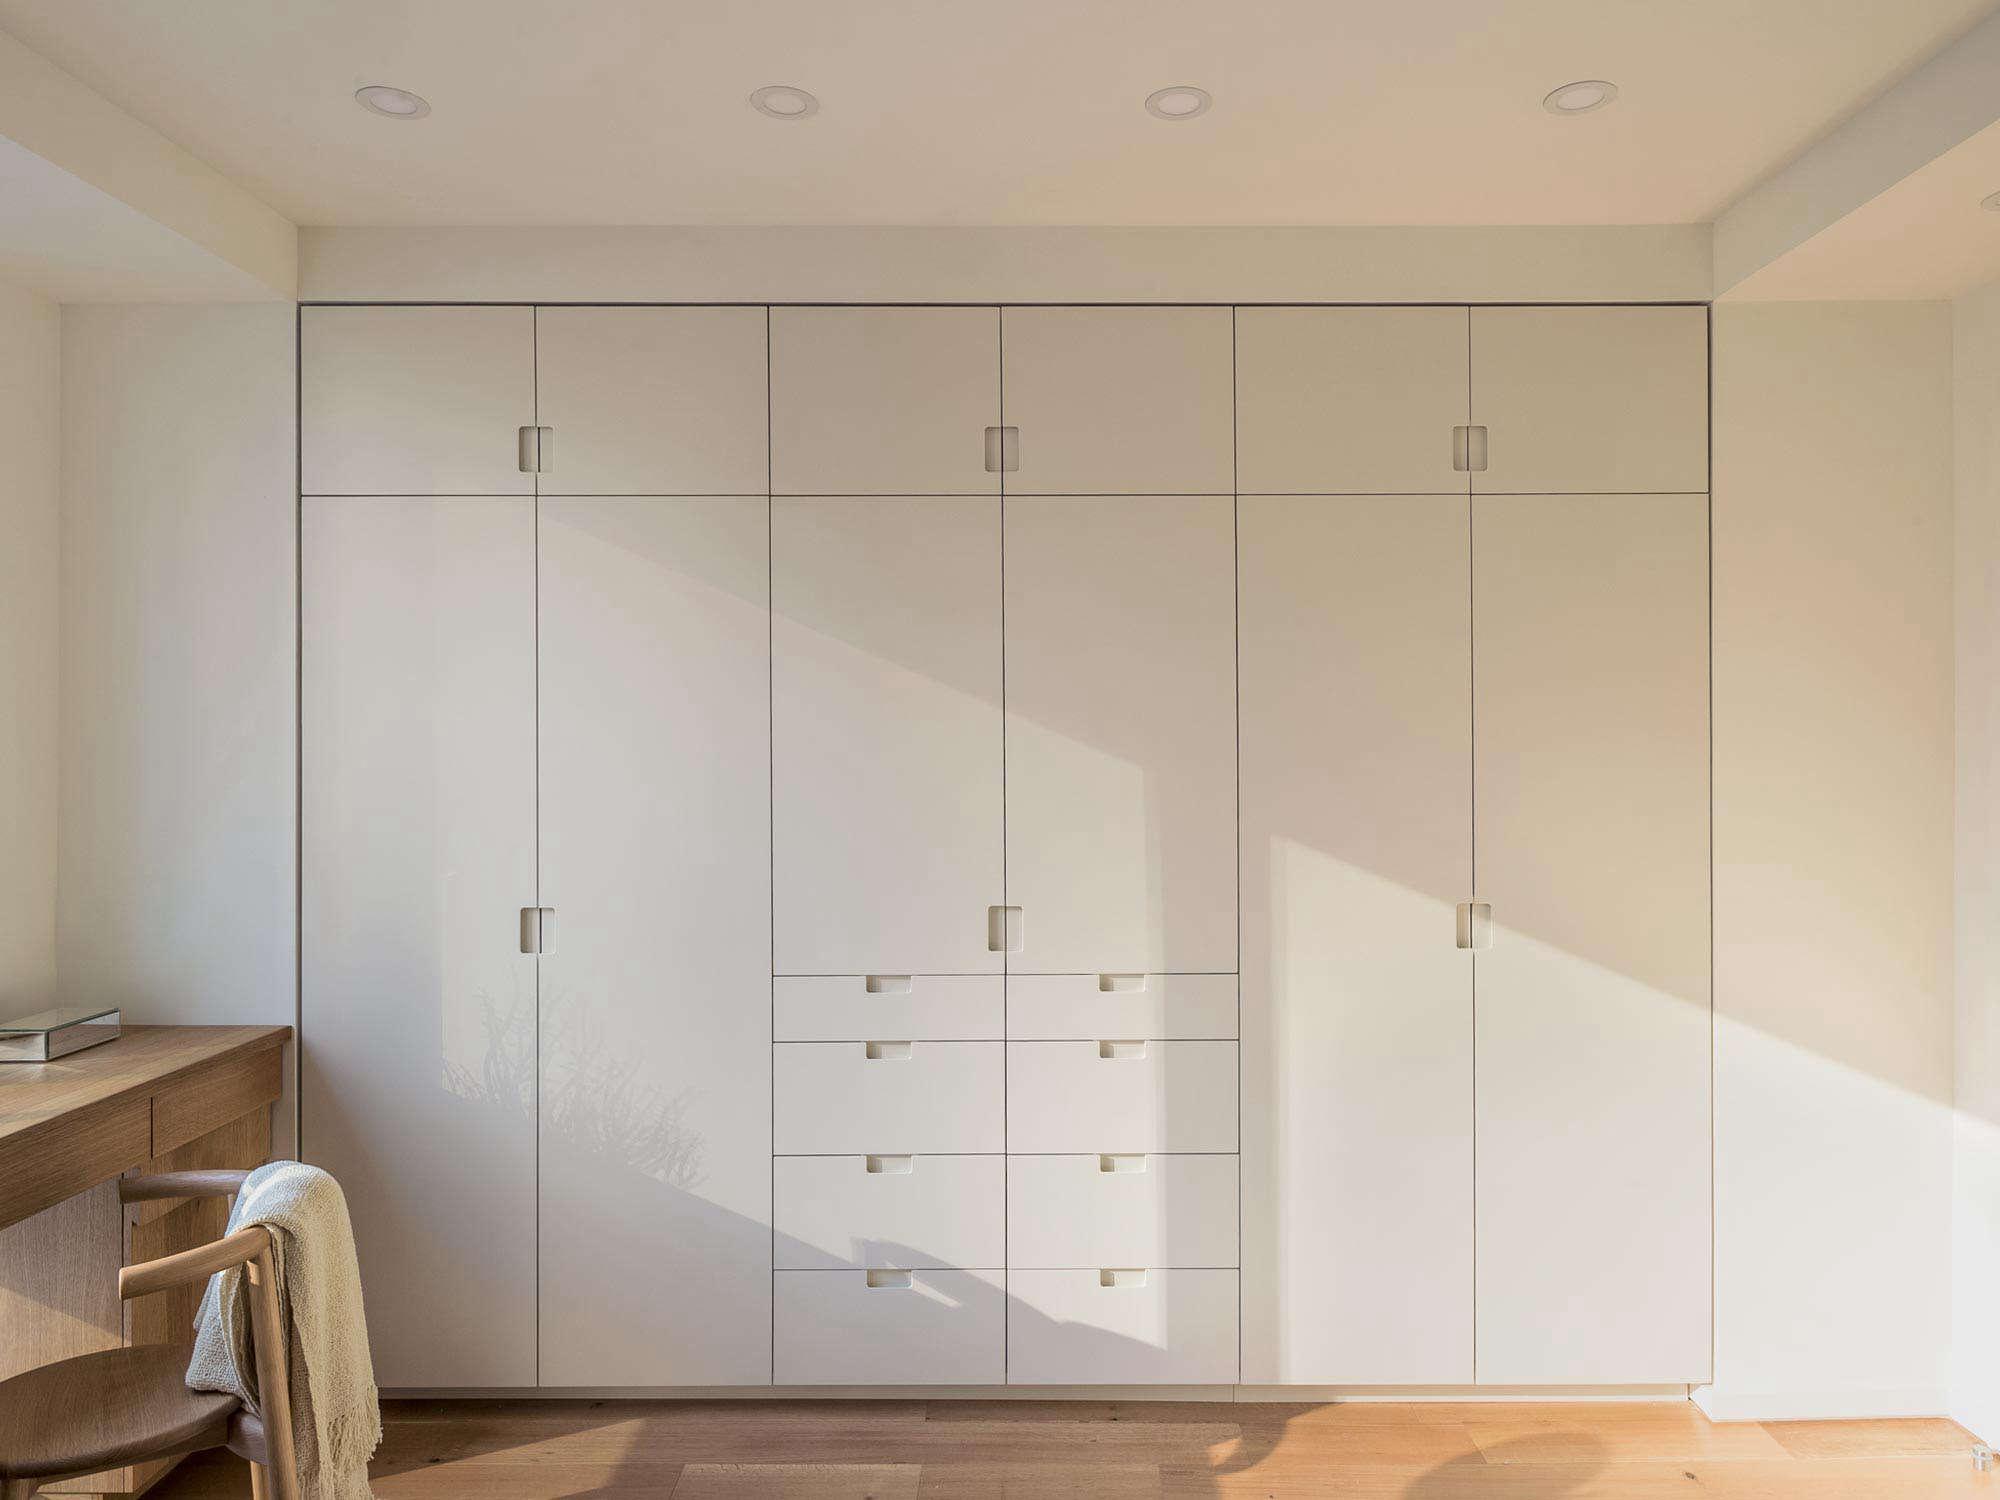 Workstead-Riverside-Blvd-remodel-bedroom-custom-built-in-closet-wall-flush-pivot-doors-9